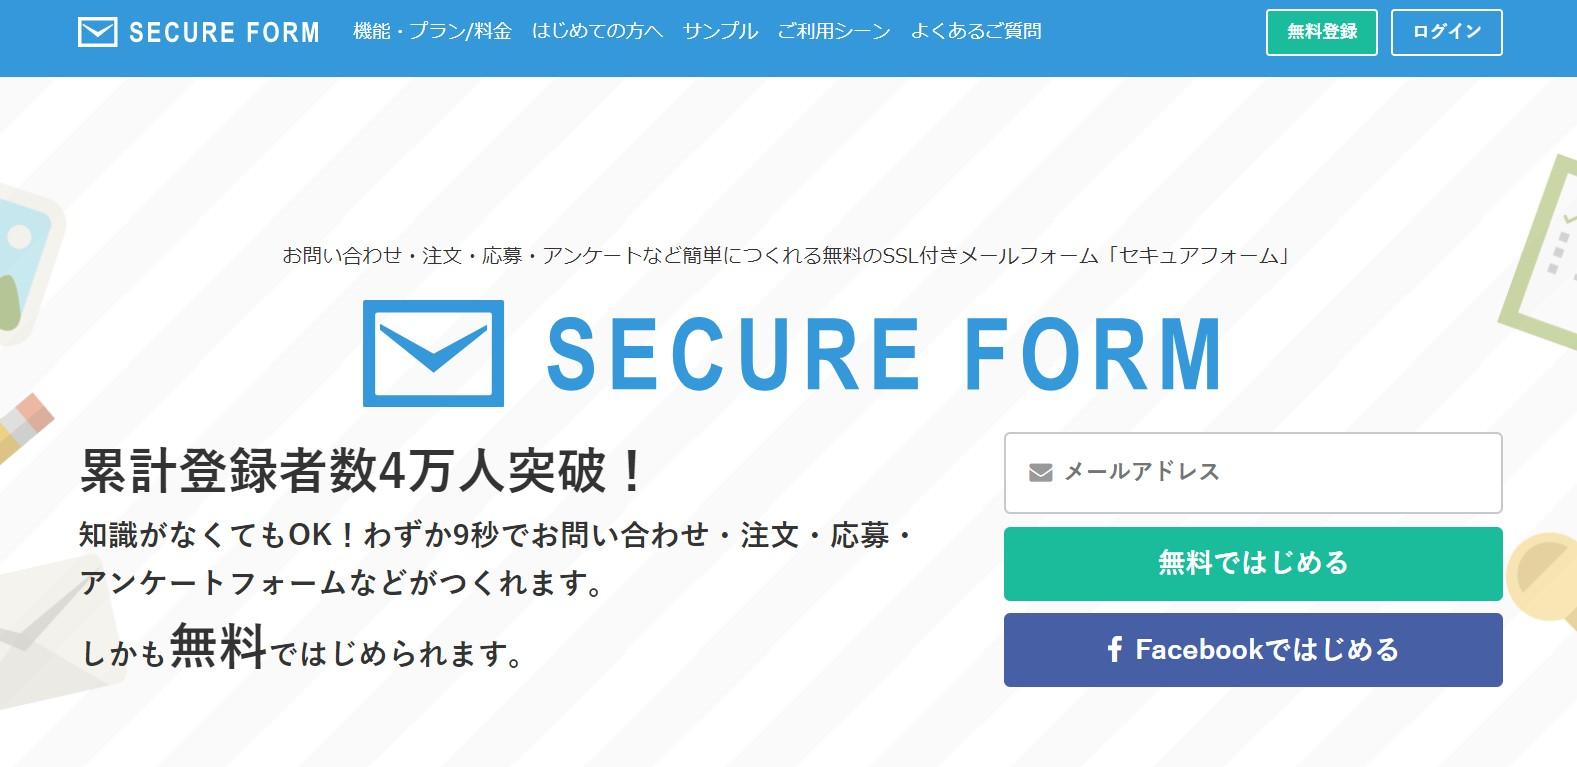 img_secure_form.jpg